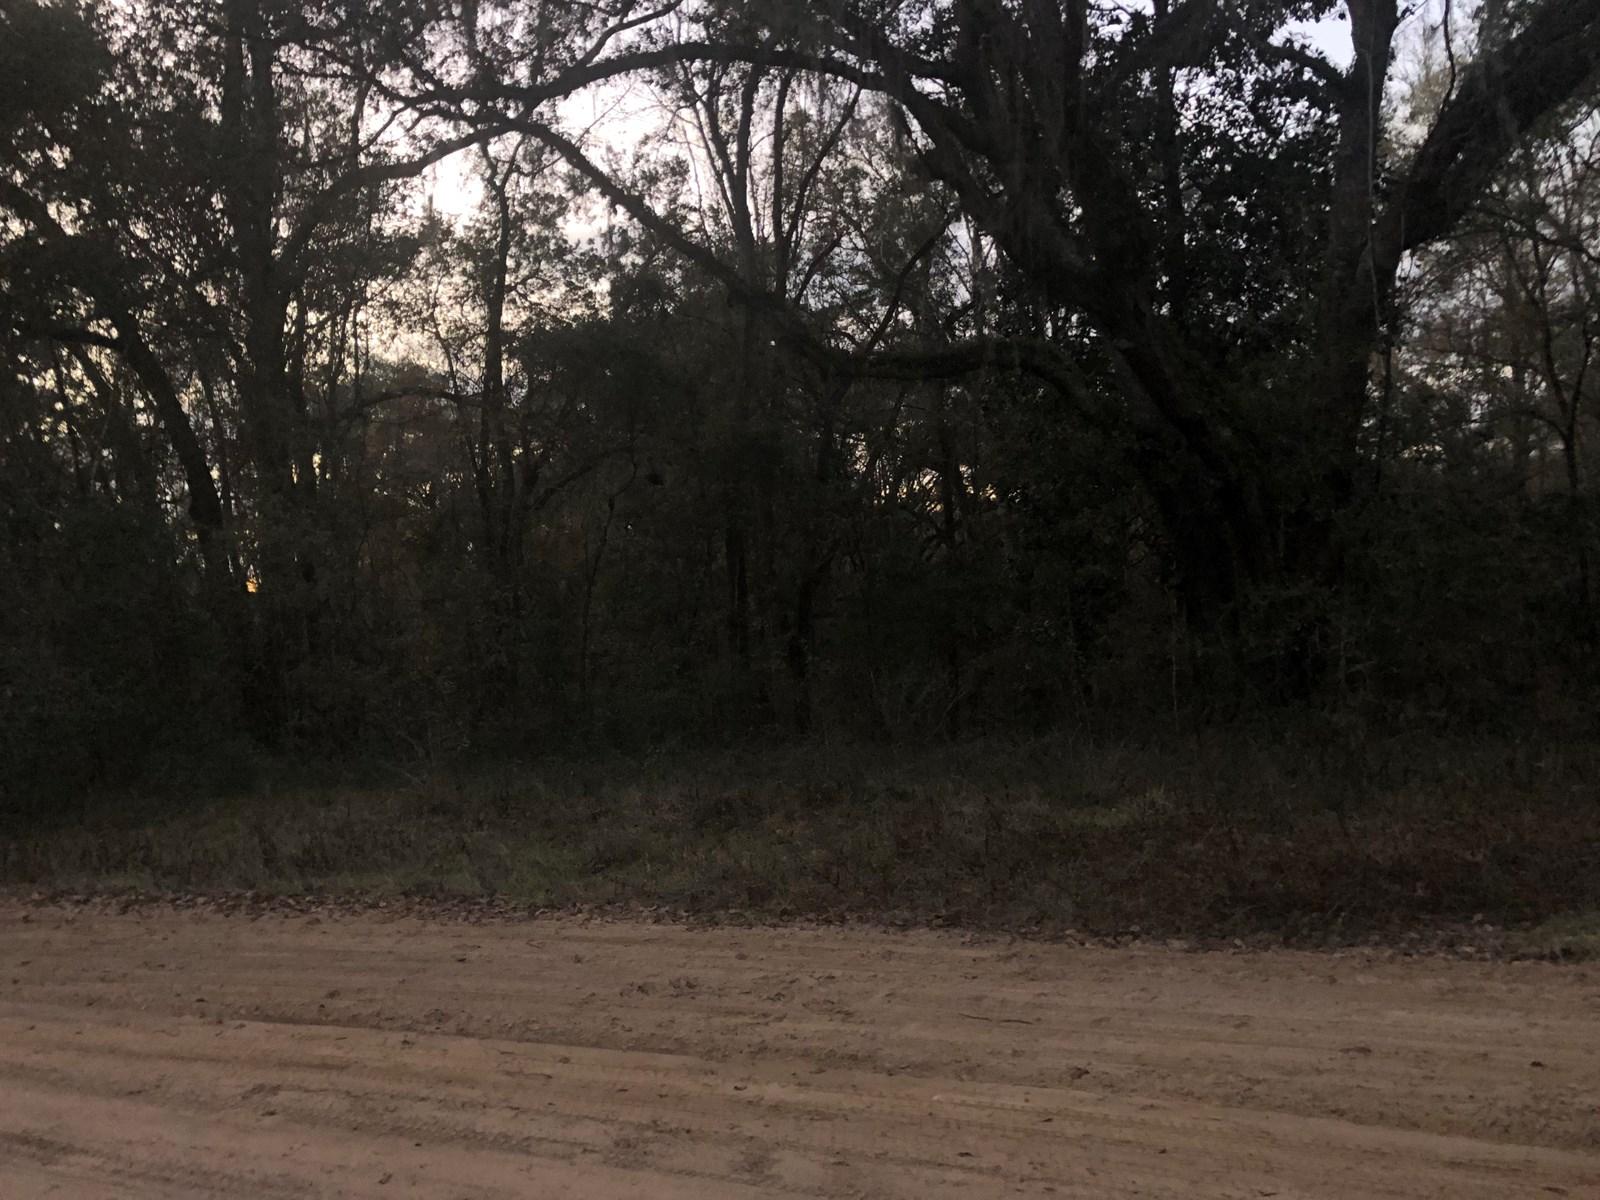 Land For Sale Near Monticello Florida